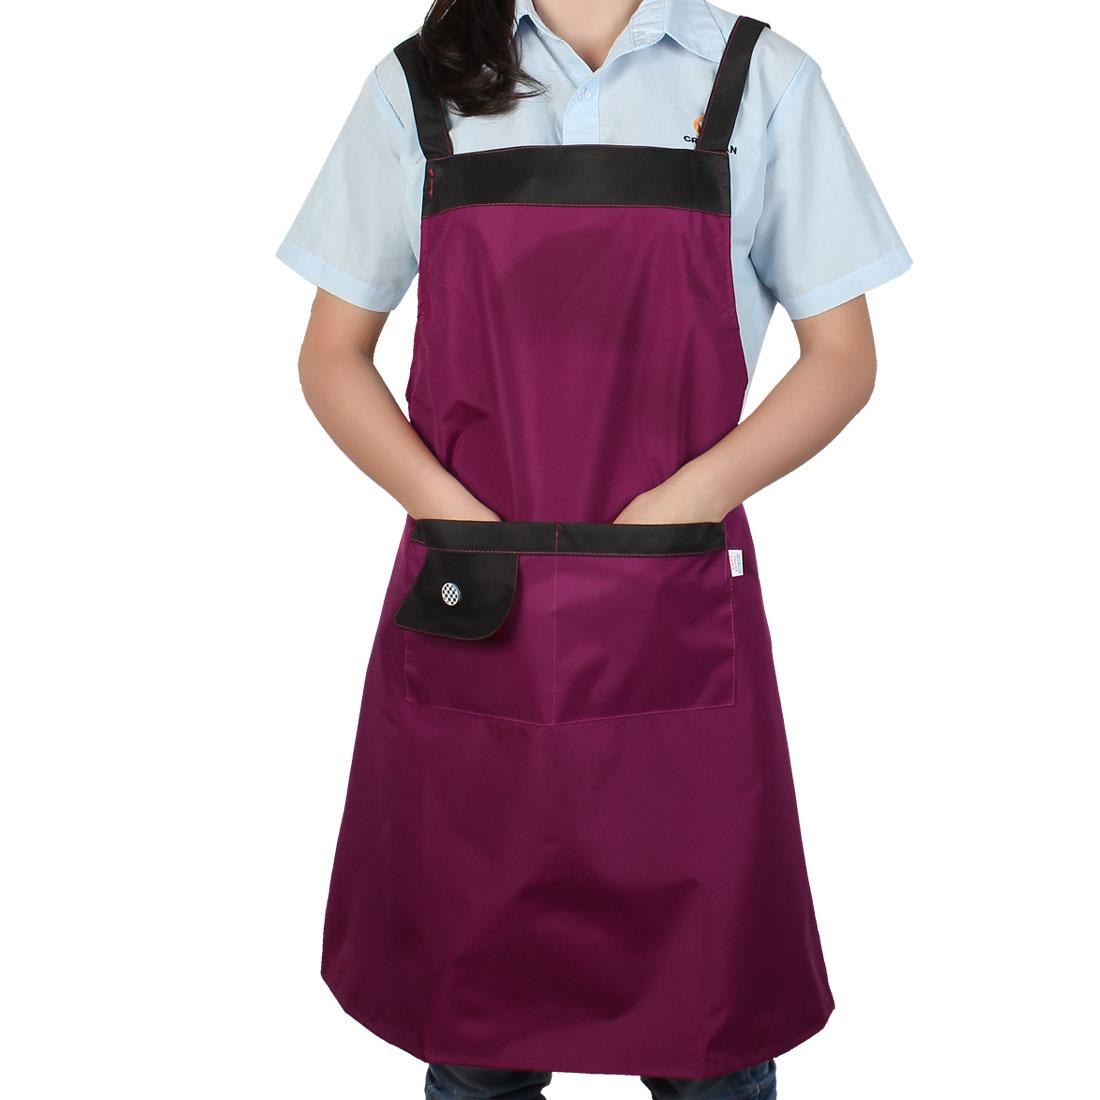 Household Restaurant Kitchen Waterproof Fuchsia Cooking Apron Bib Dress w Pockets